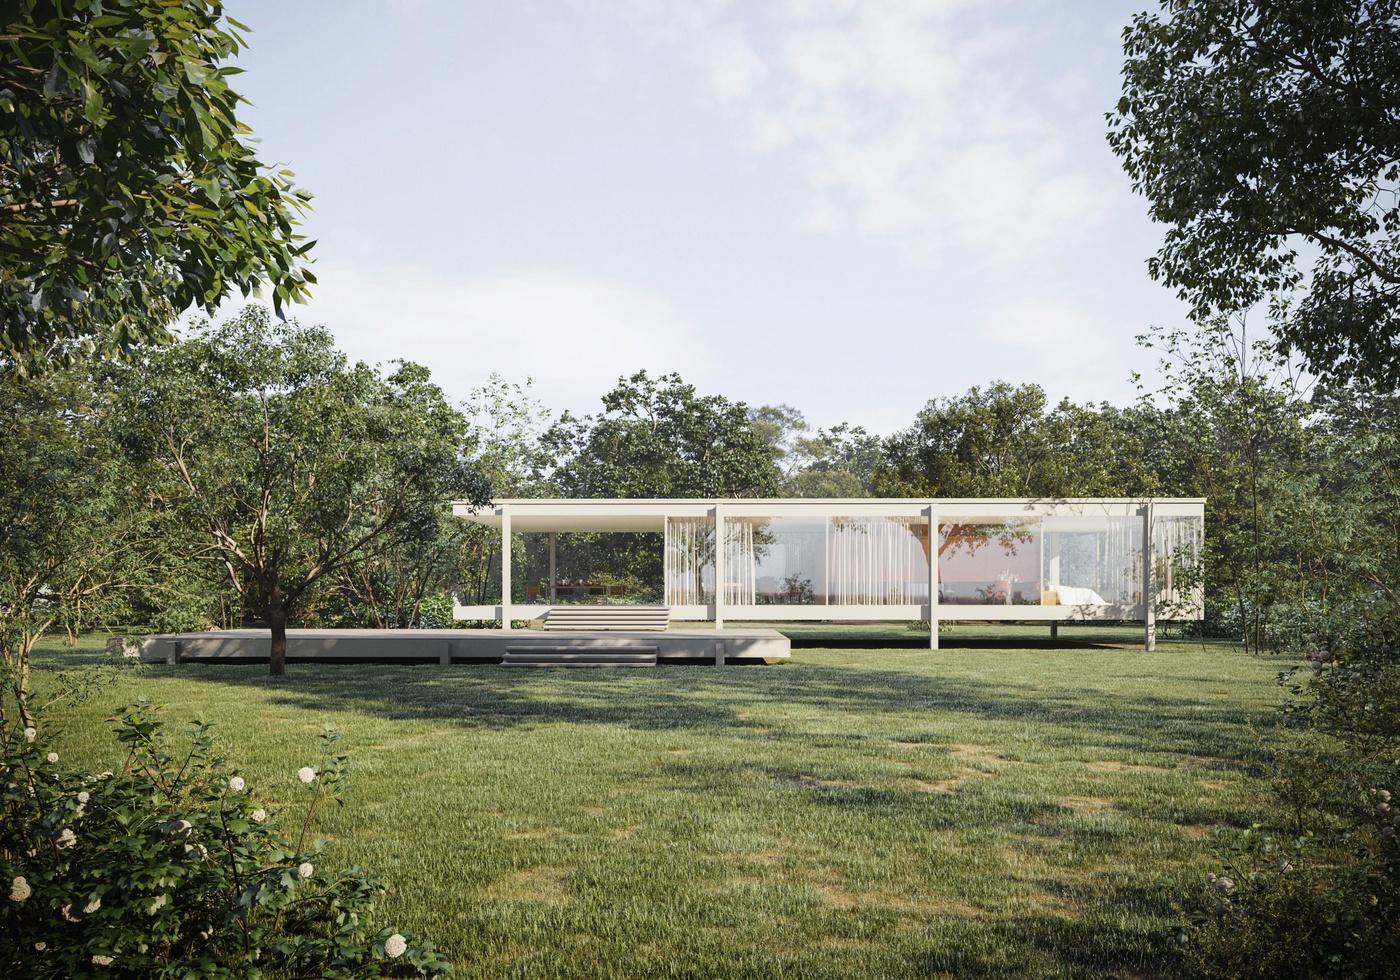 nature housing model render 3d location